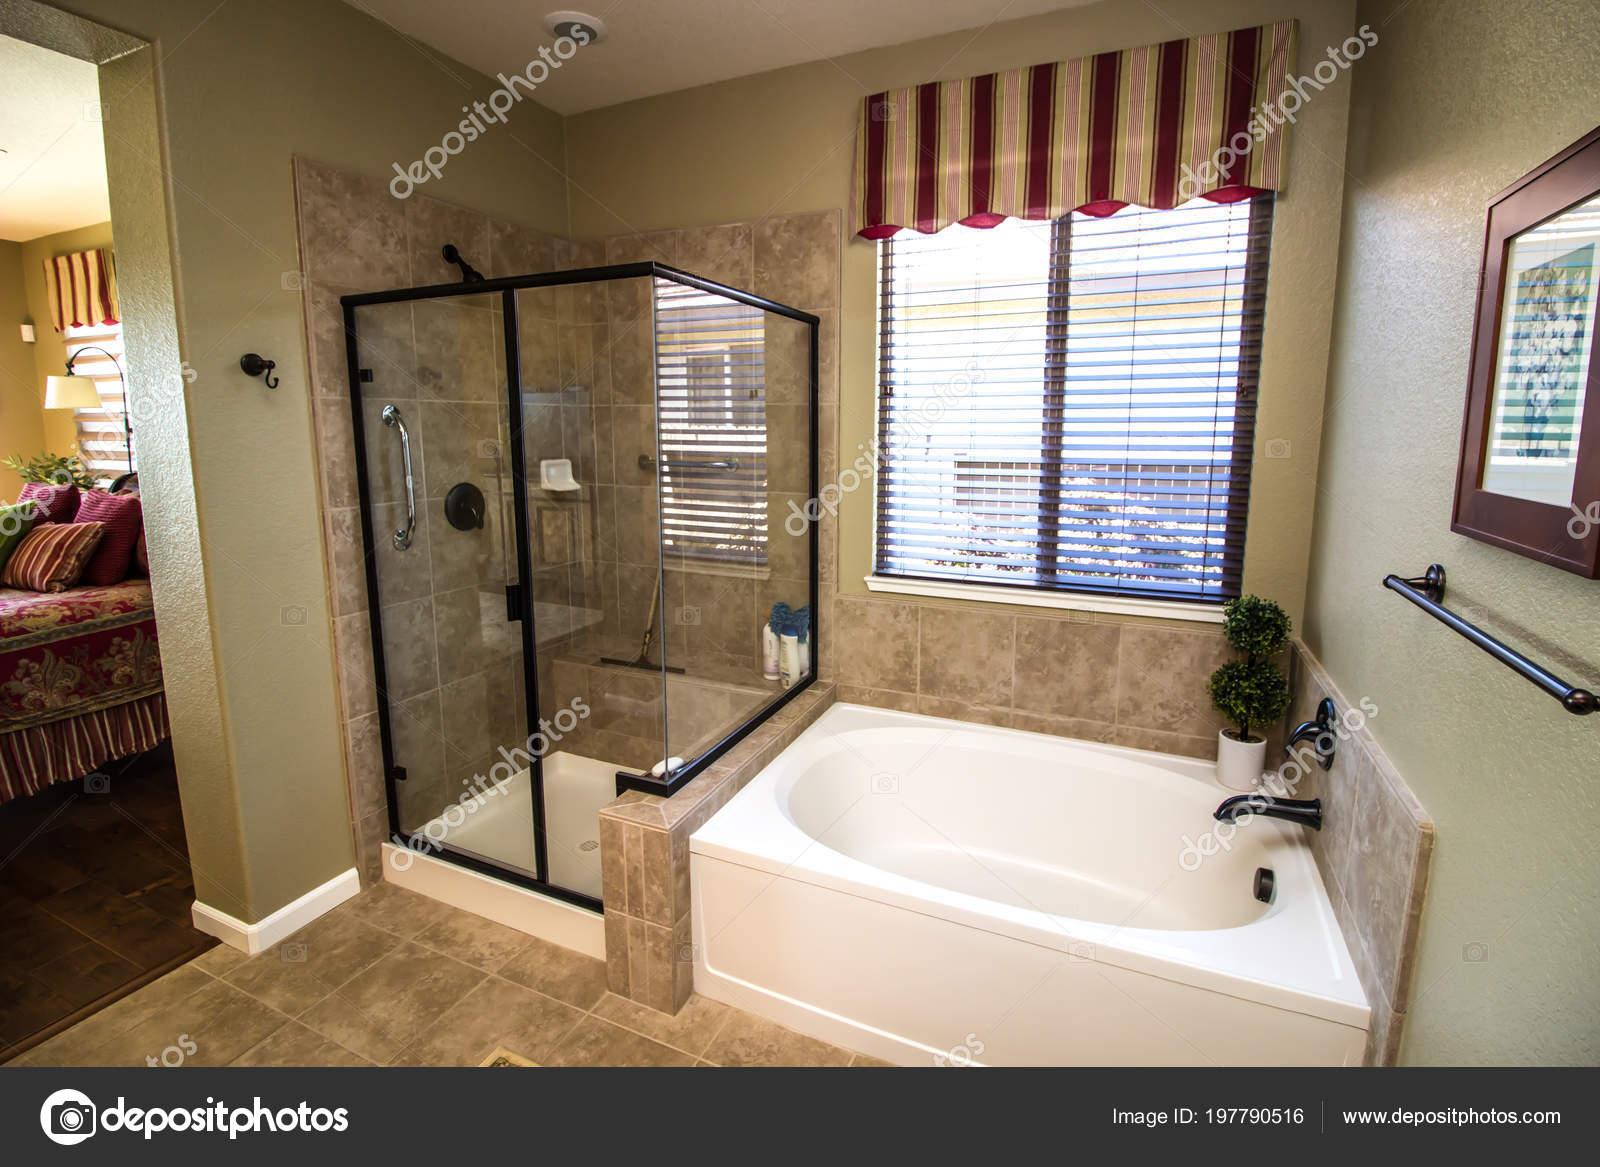 Bagno moderno con vasca doccia vetro foto stock weezybob5 197790516 - Bagno moderno con doccia ...